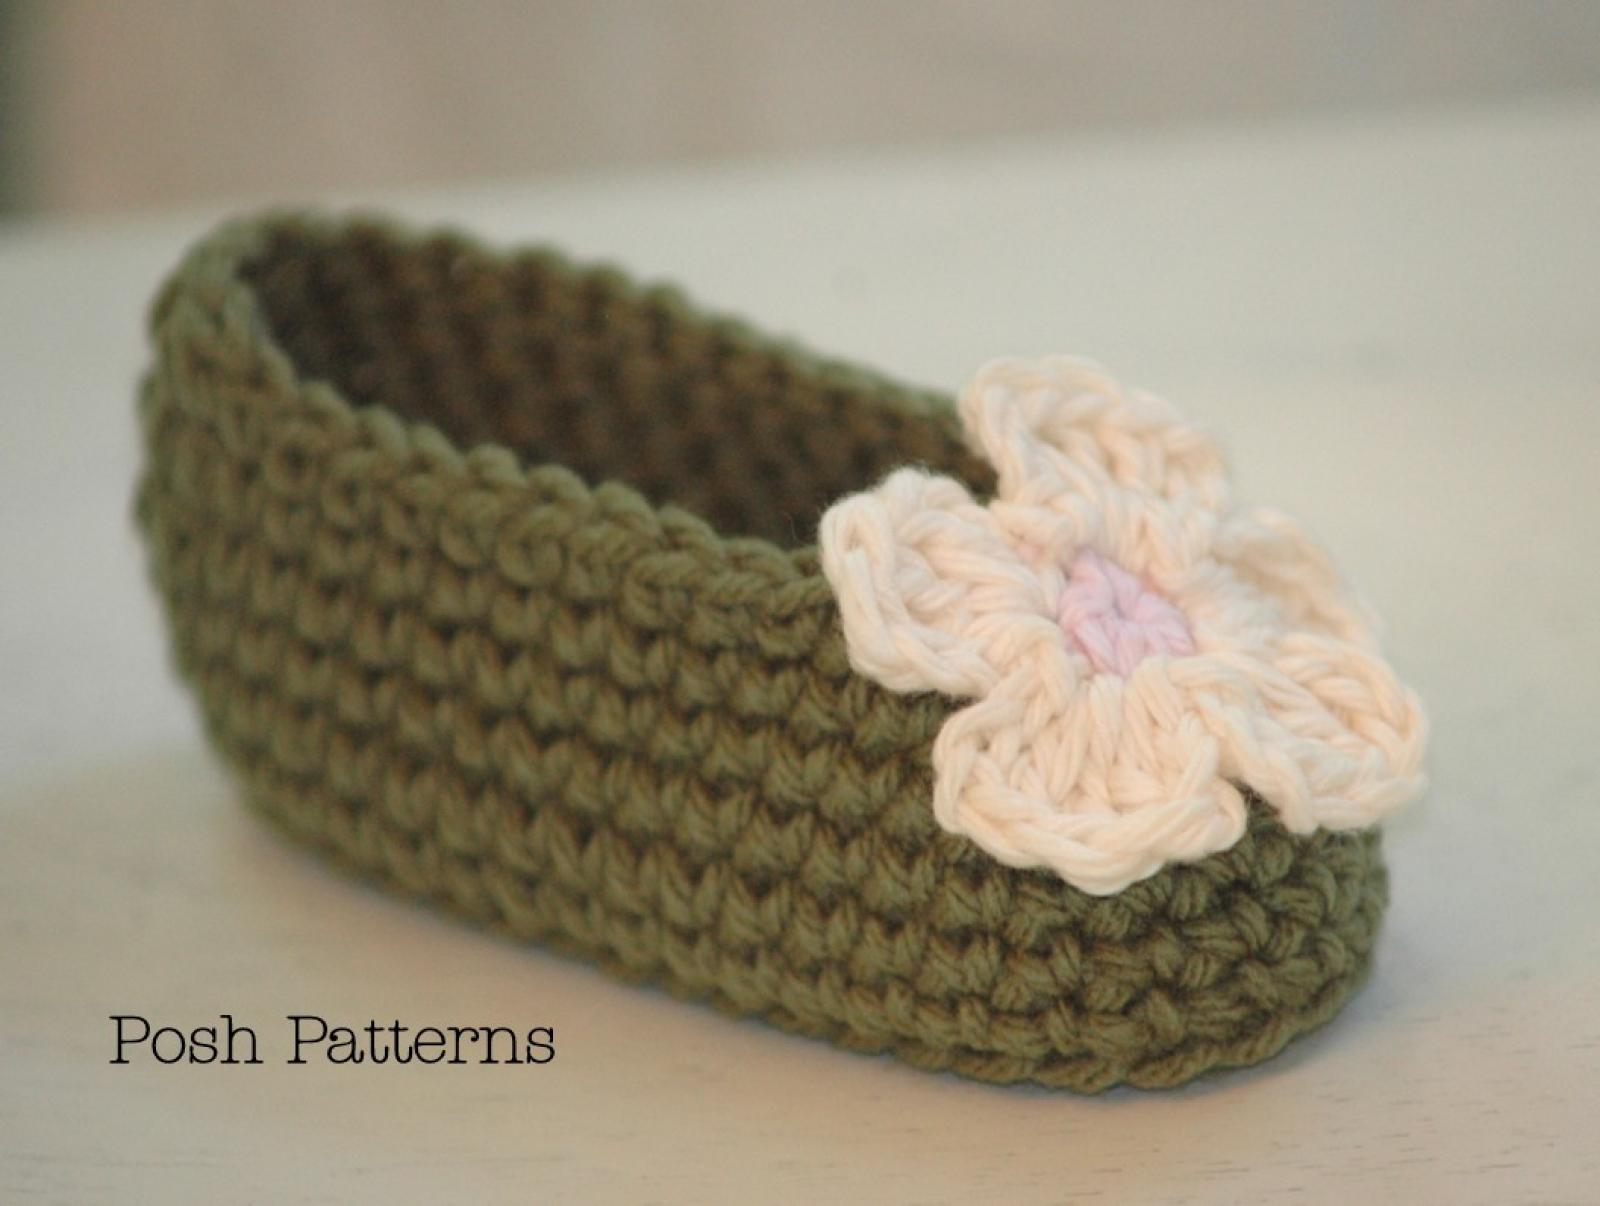 Shoes booties slipper mitten patterns posh patterns easy crochet pattern baby booties slippers and flower bankloansurffo Images